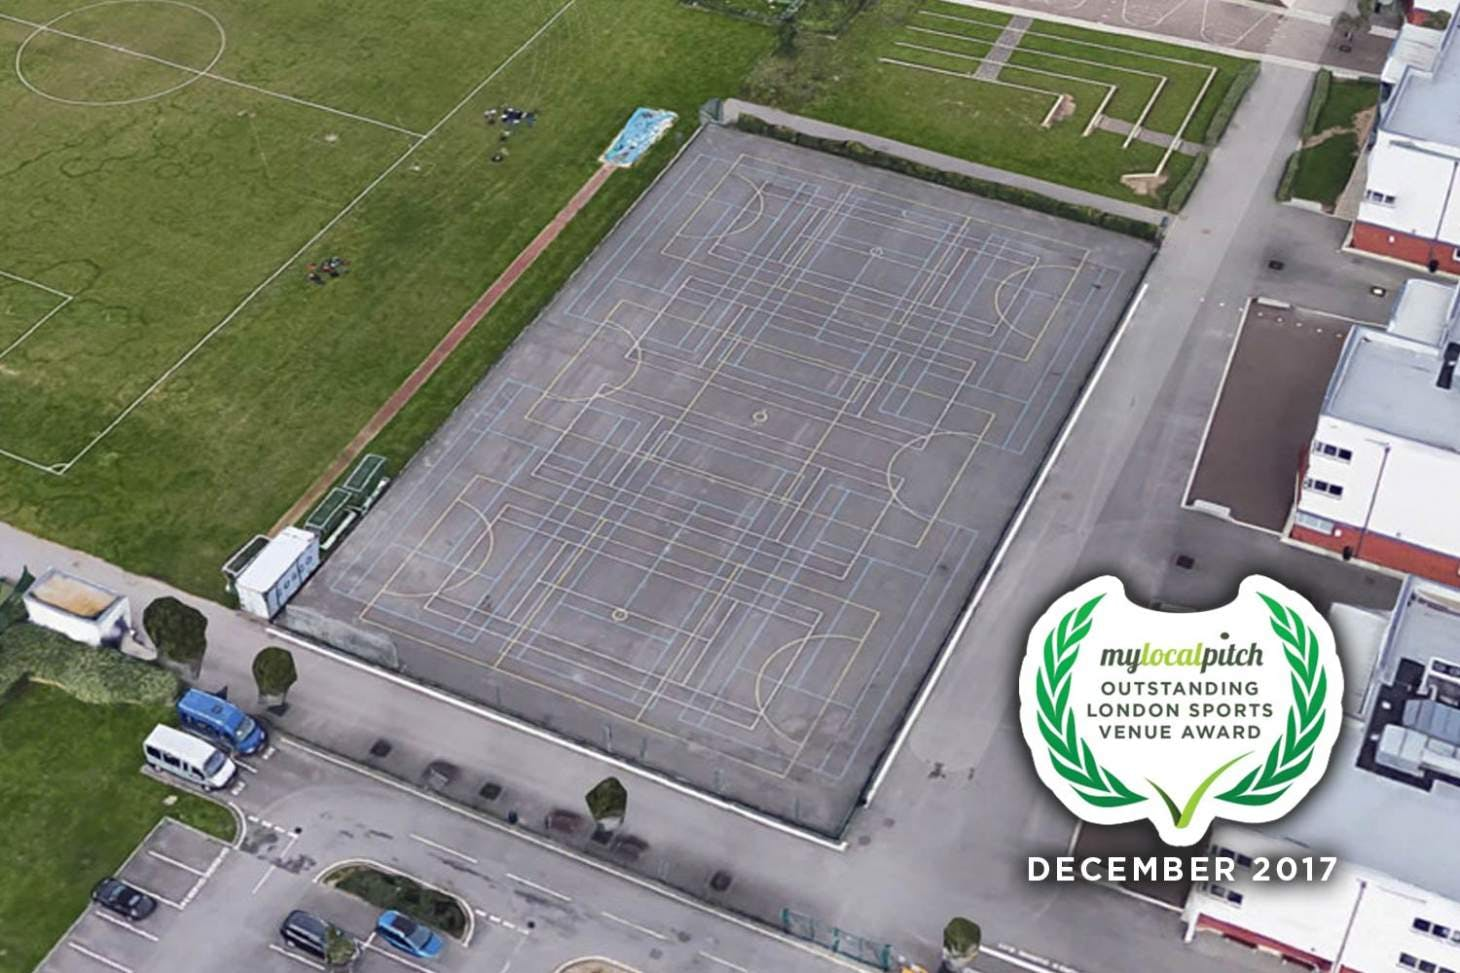 Castle Green Leisure Centre 5 a side | Concrete football pitch